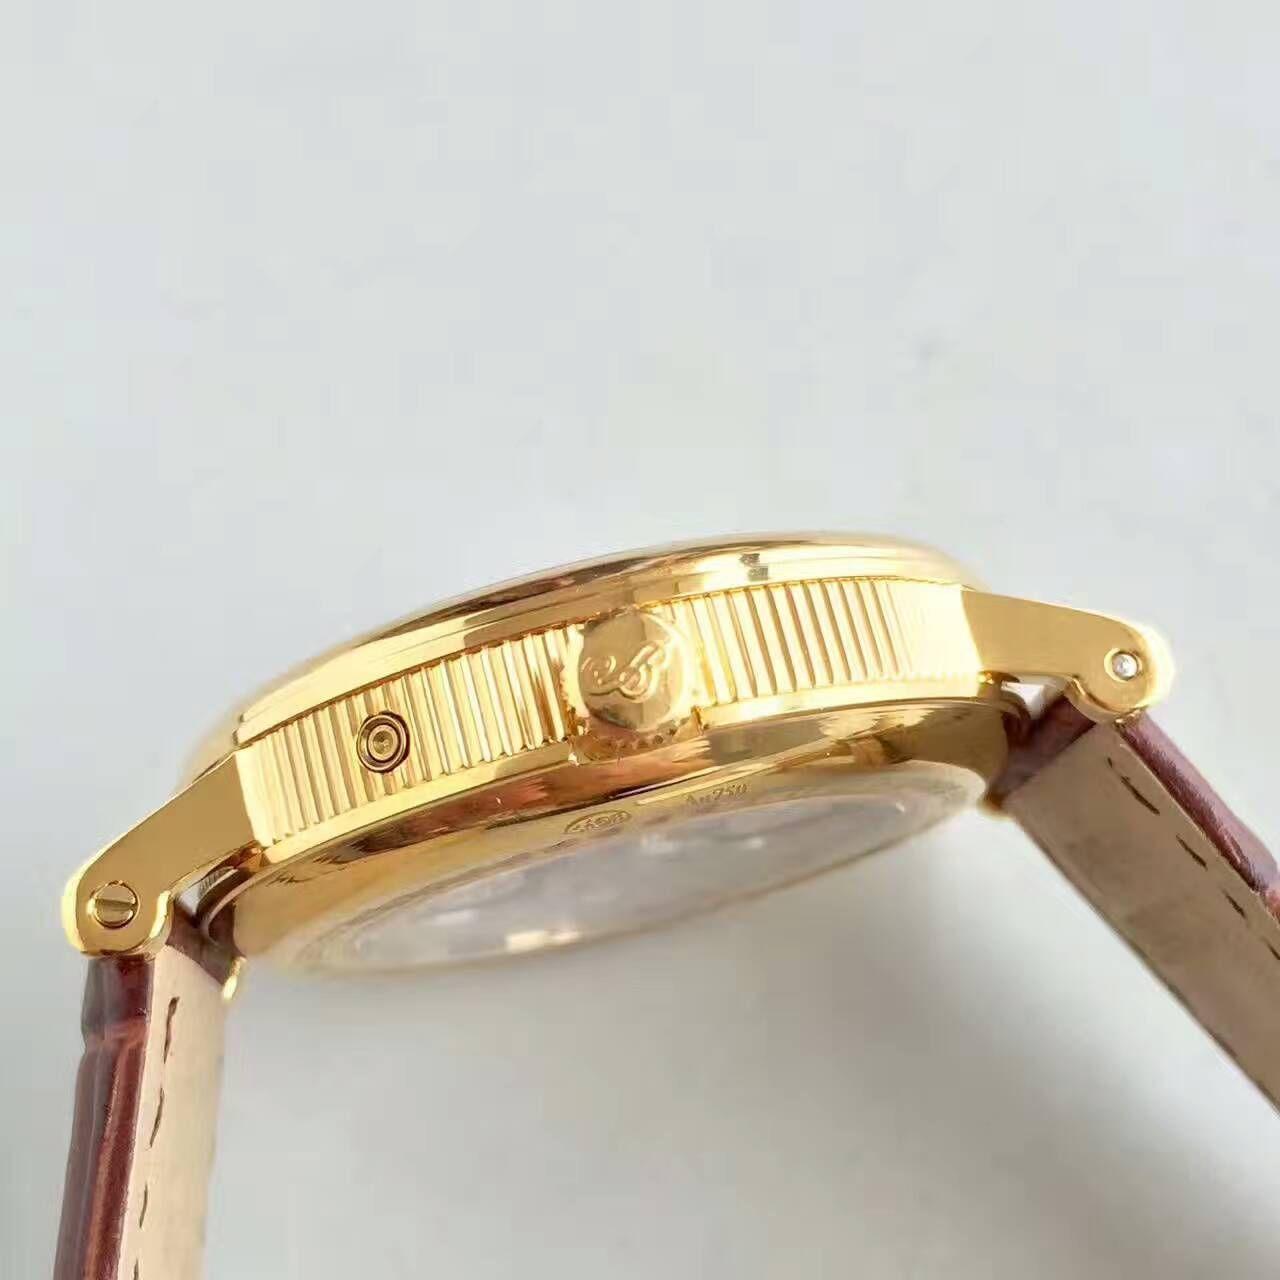 【VF厂顶级一比一复刻手表】宝玑经典系列7137BA/11/9V6 黄金月相腕表